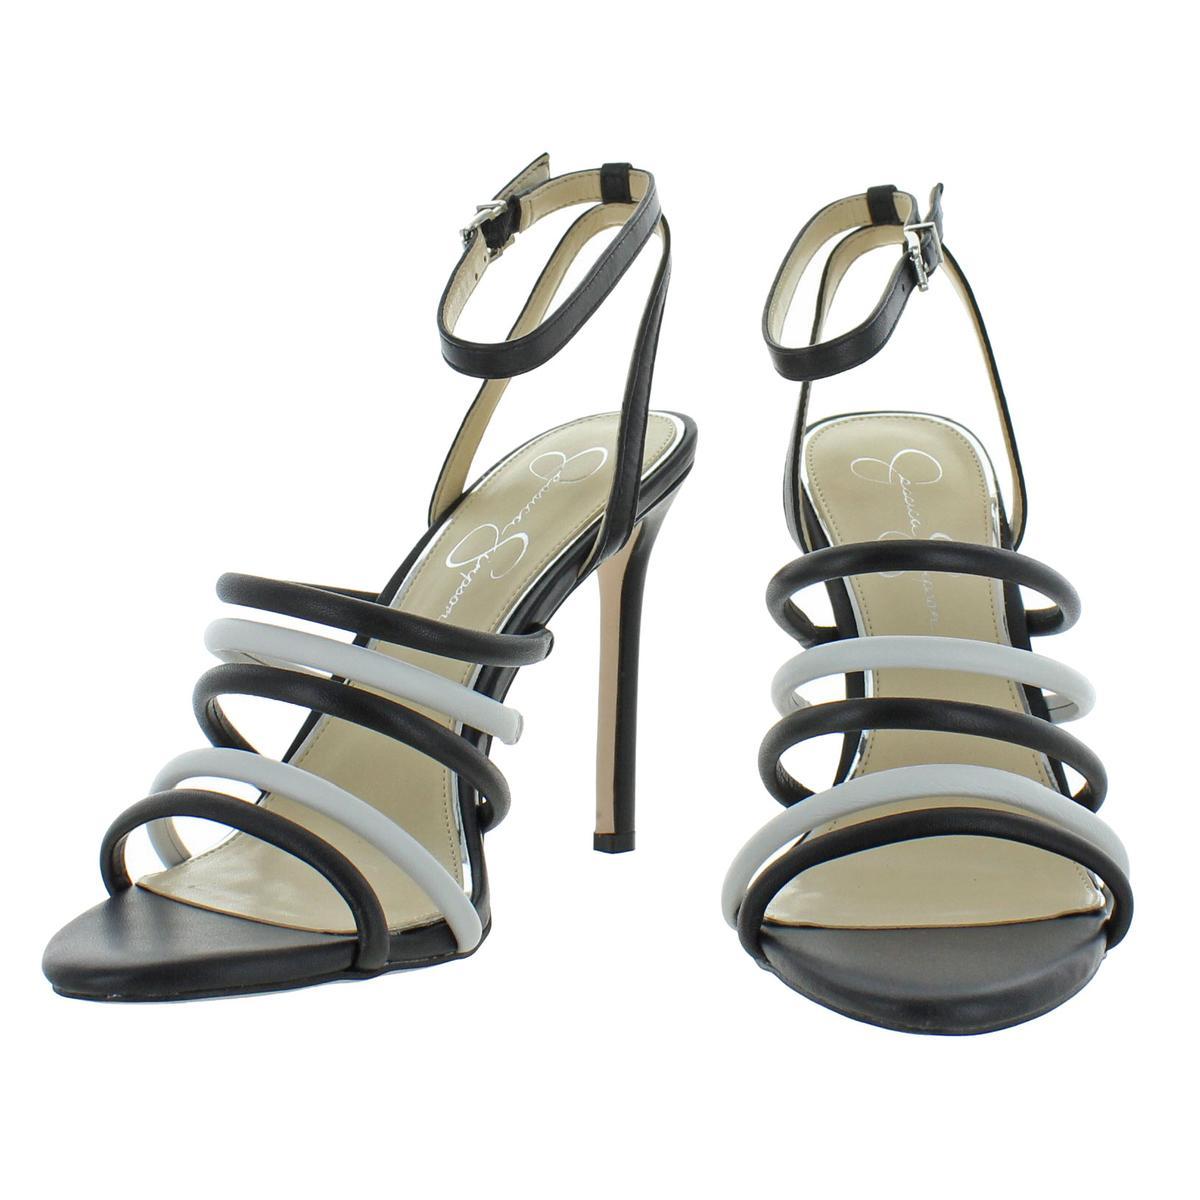 Jessica-Simpson-Femme-Joselle-a-Lanieres-Talon-Haut-Robe-Sandales-Chaussures-BHFO-7879 miniature 5